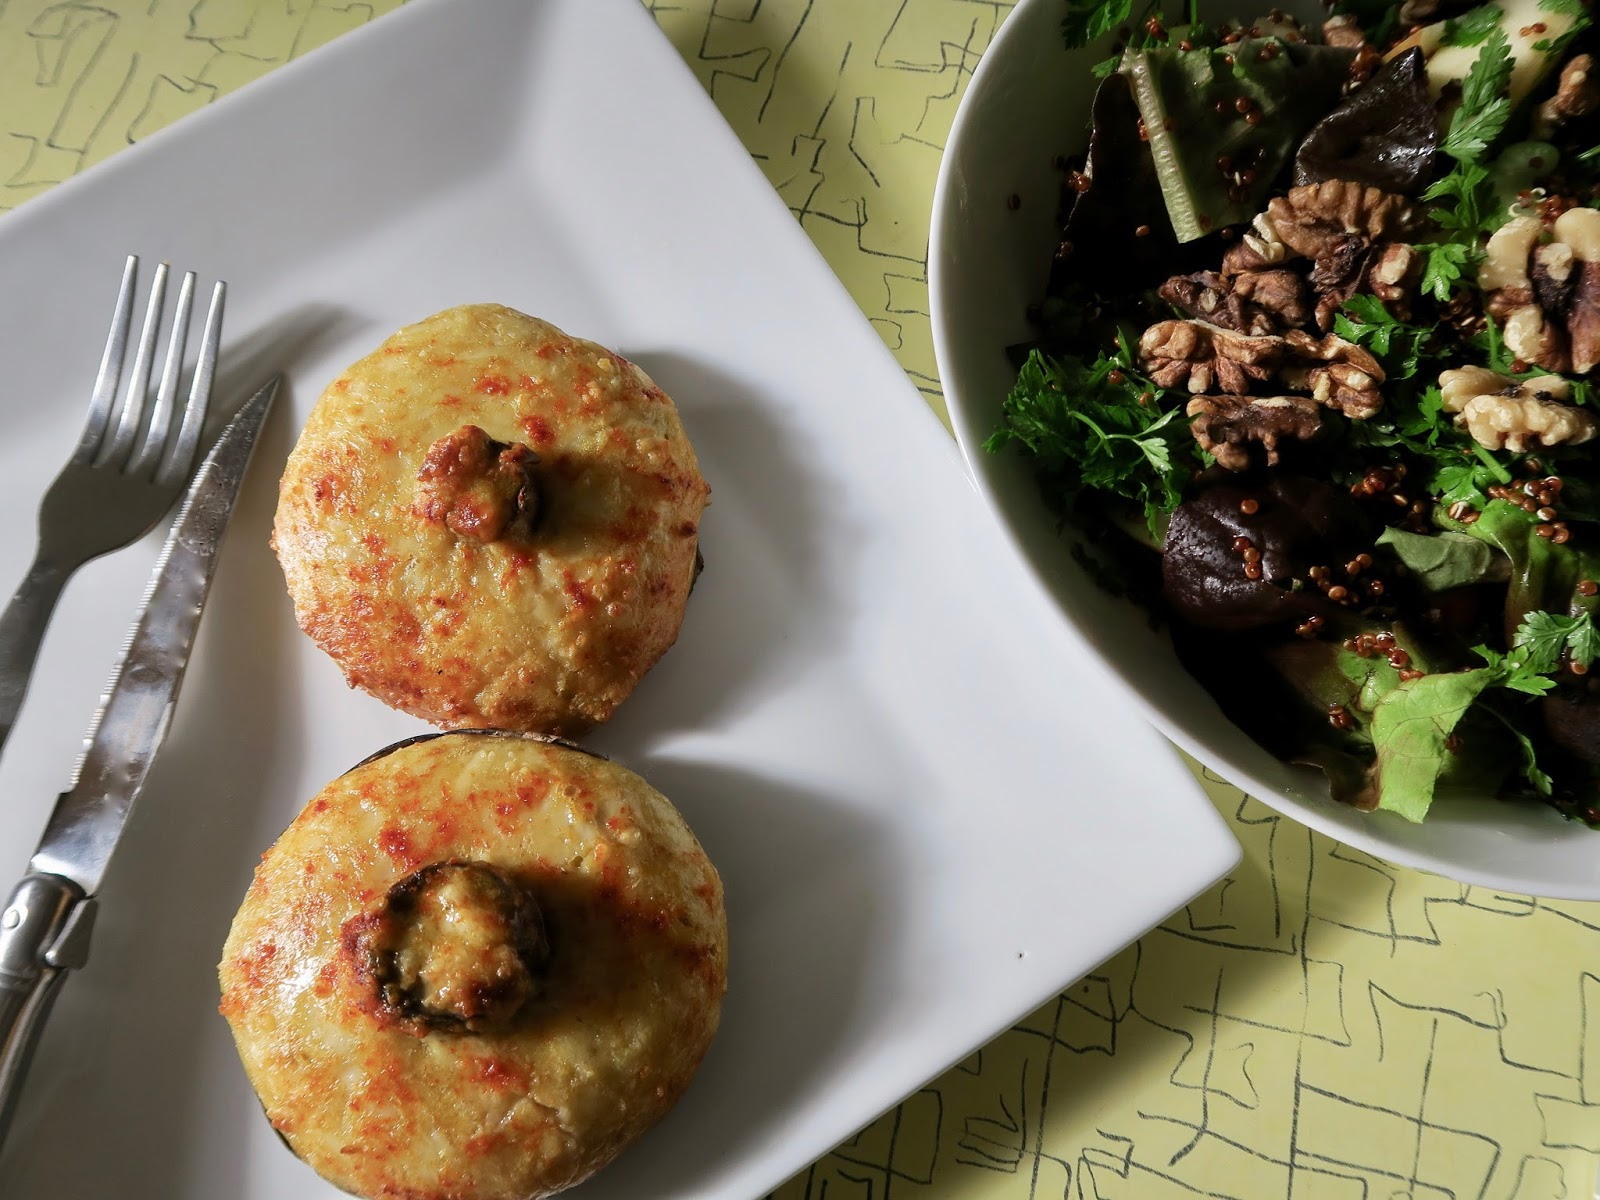 Speedy mushroom rarebit with walnut and quinoa salad